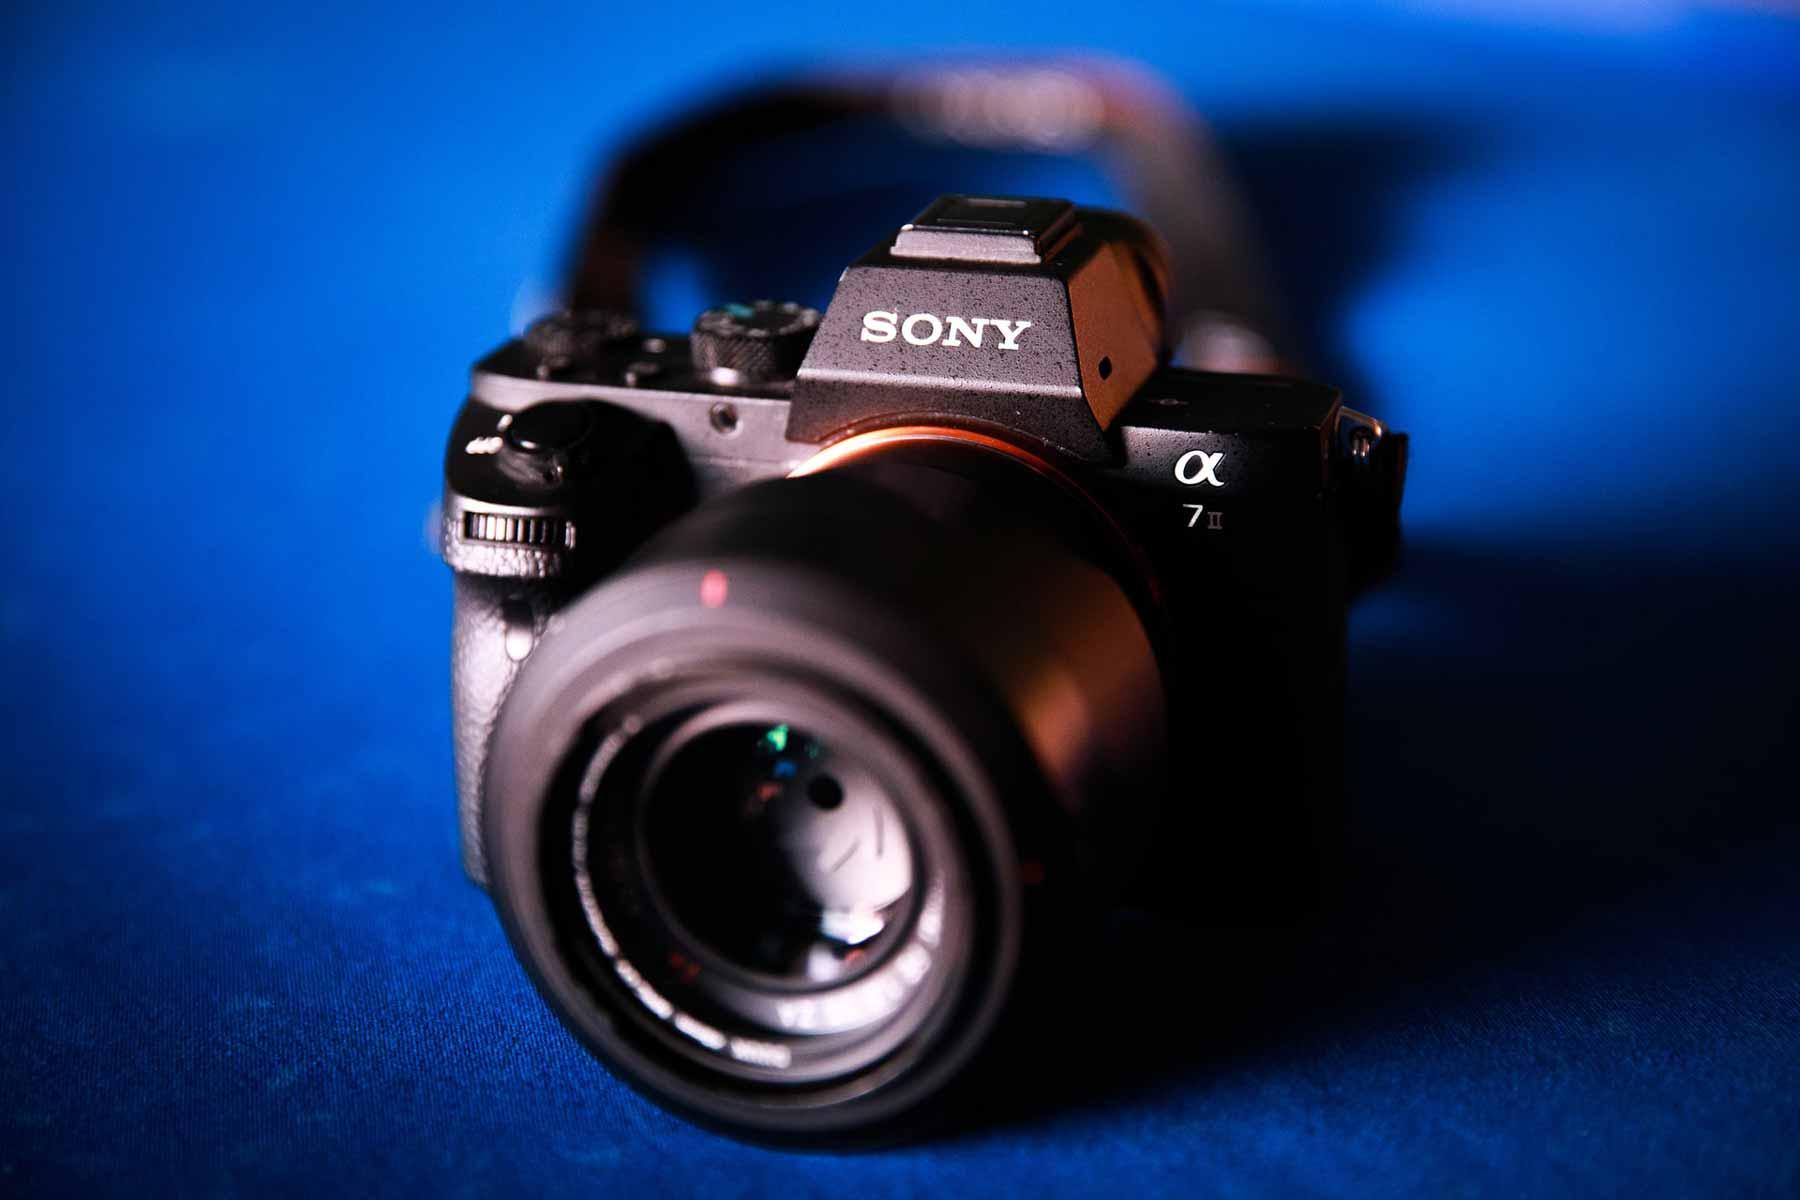 97 Sony Photography Hashtags for the Aspiring Sony Photographer